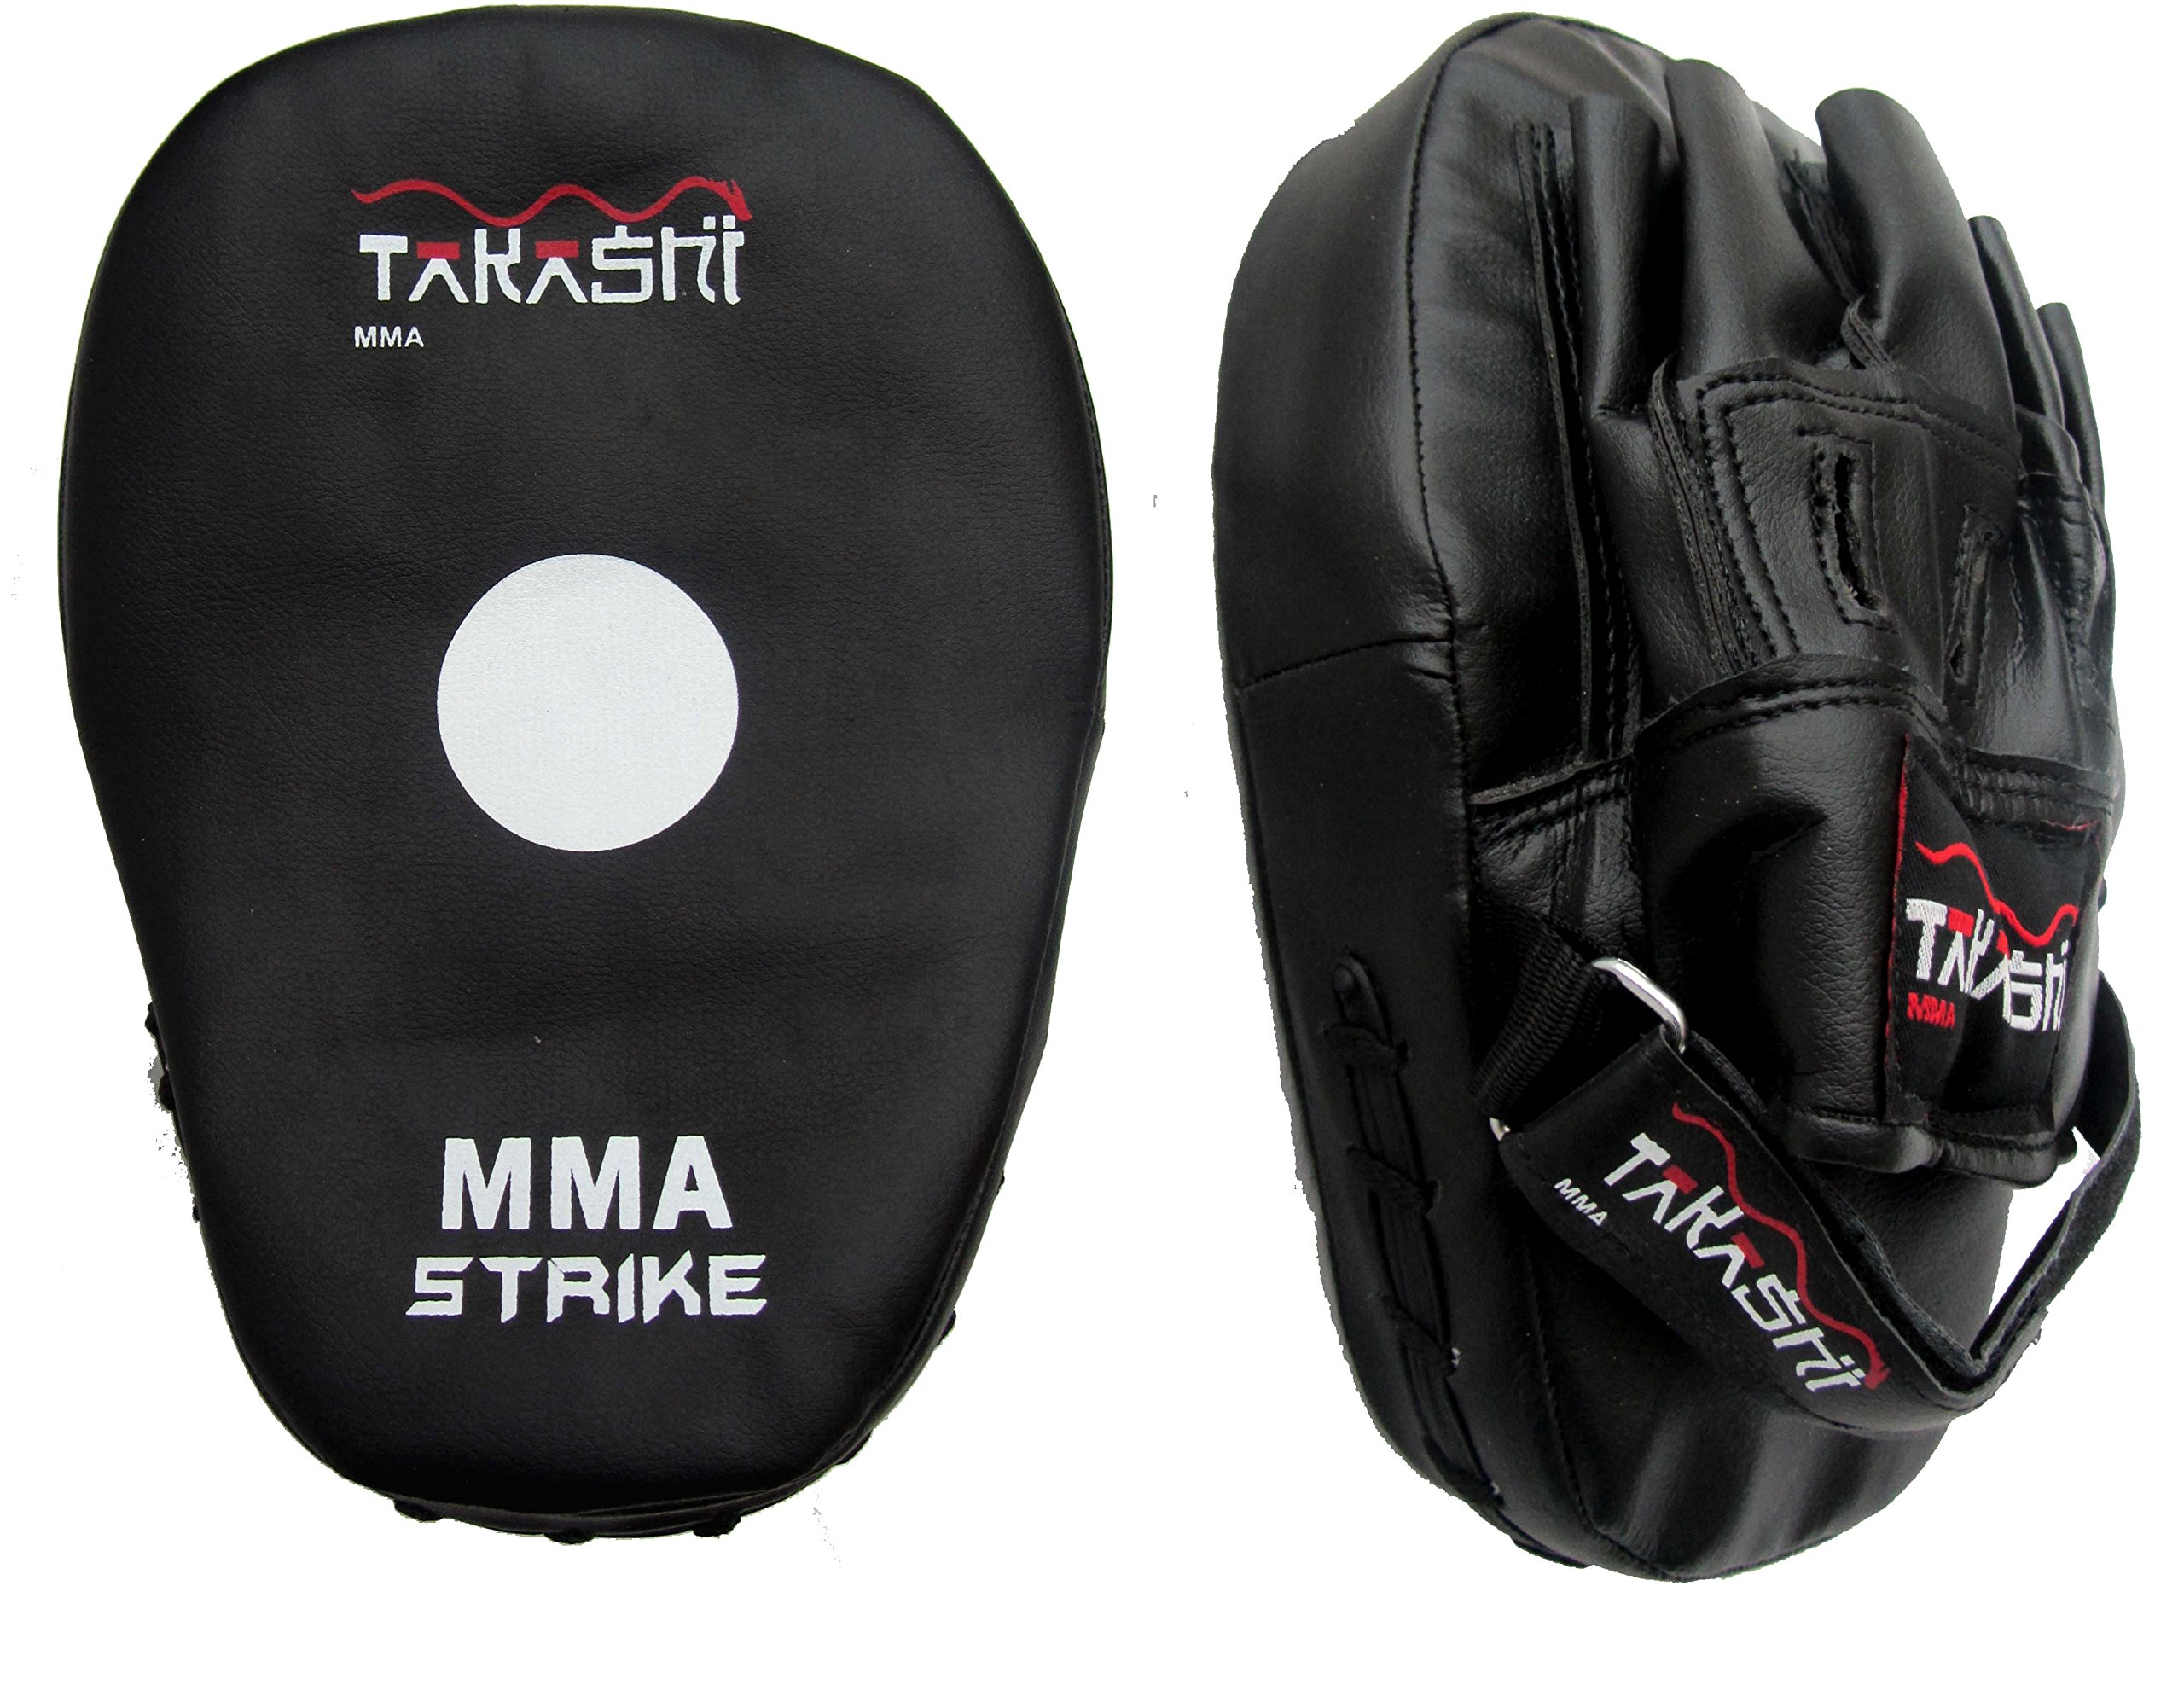 MMA Punch Mitts, Focus Pads Pads TAKASHI 1 Pair (Curved Pads) Karate, Kempo, Taekwondo Strike targets by Takashi